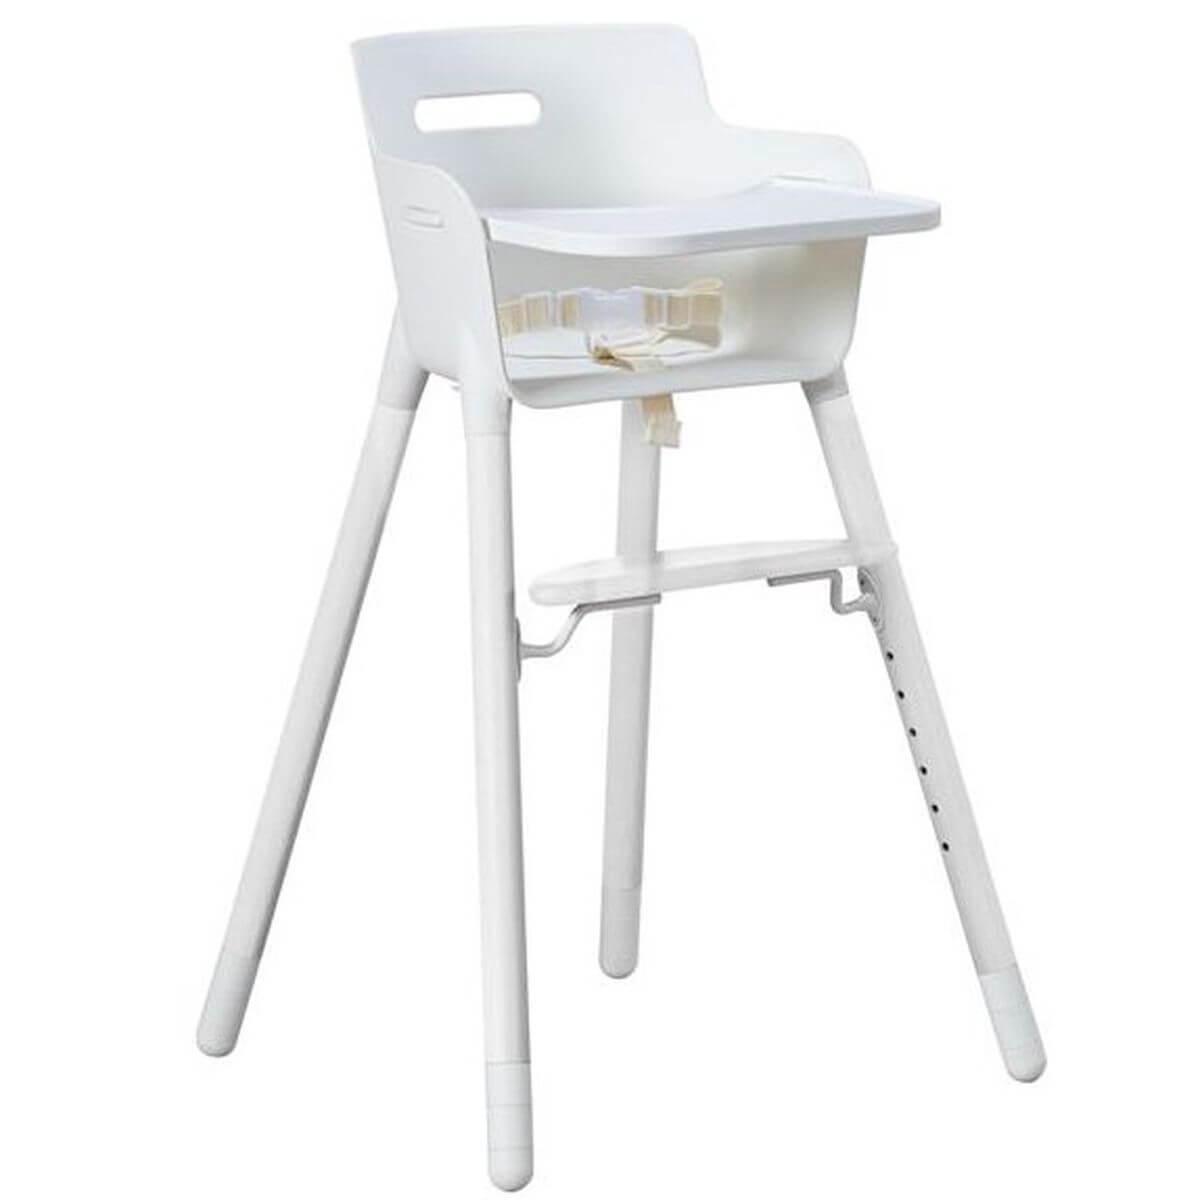 BABY by Flexa Tablette pour chaise haute Blanc